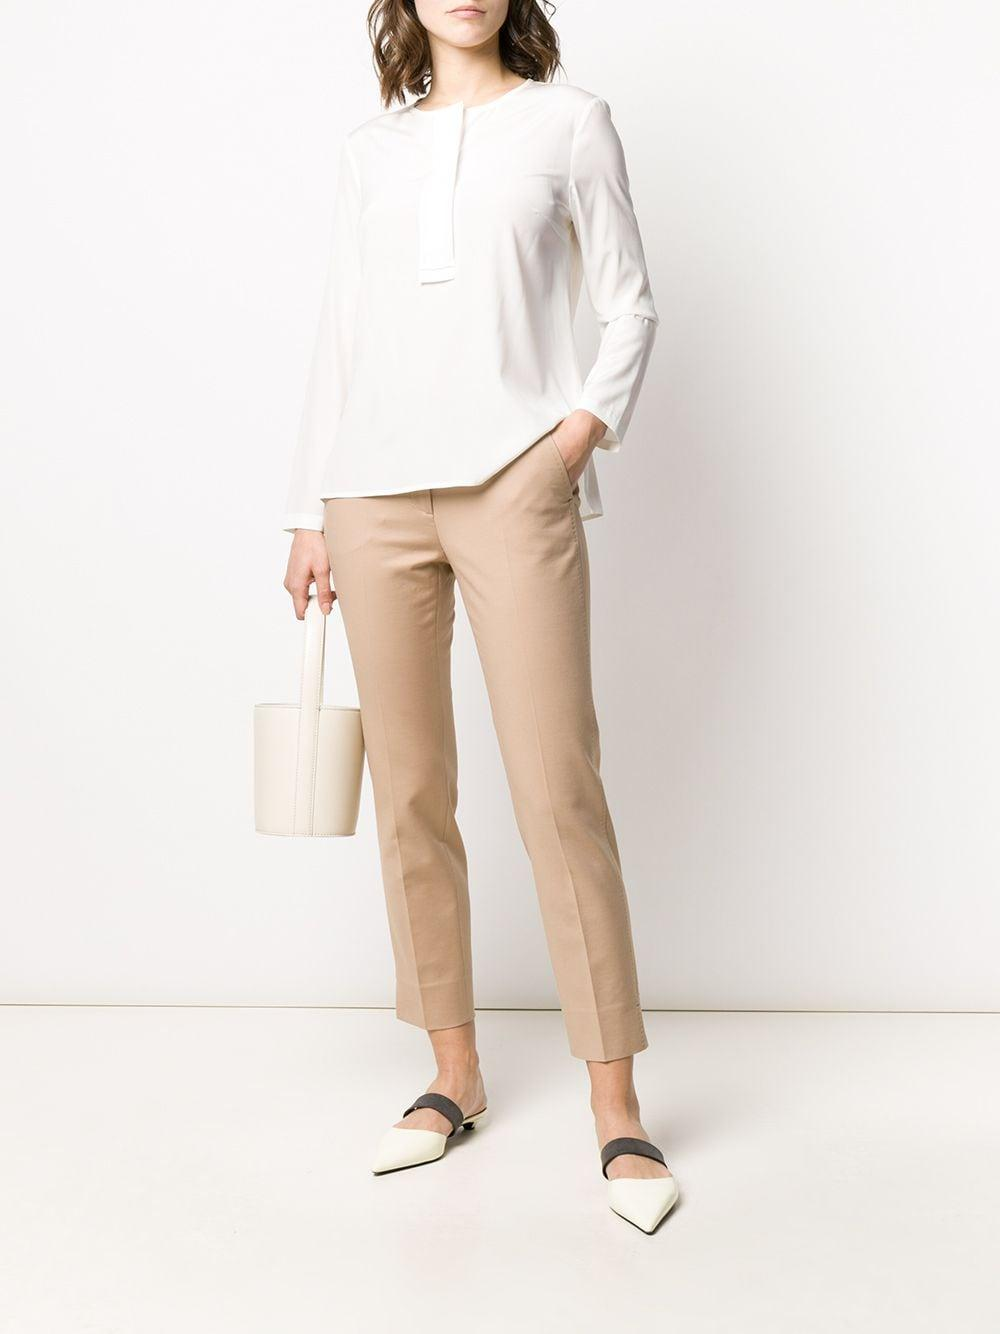 Blusa sin cuello con abertura redonda Peserico de Seda de color Blanco